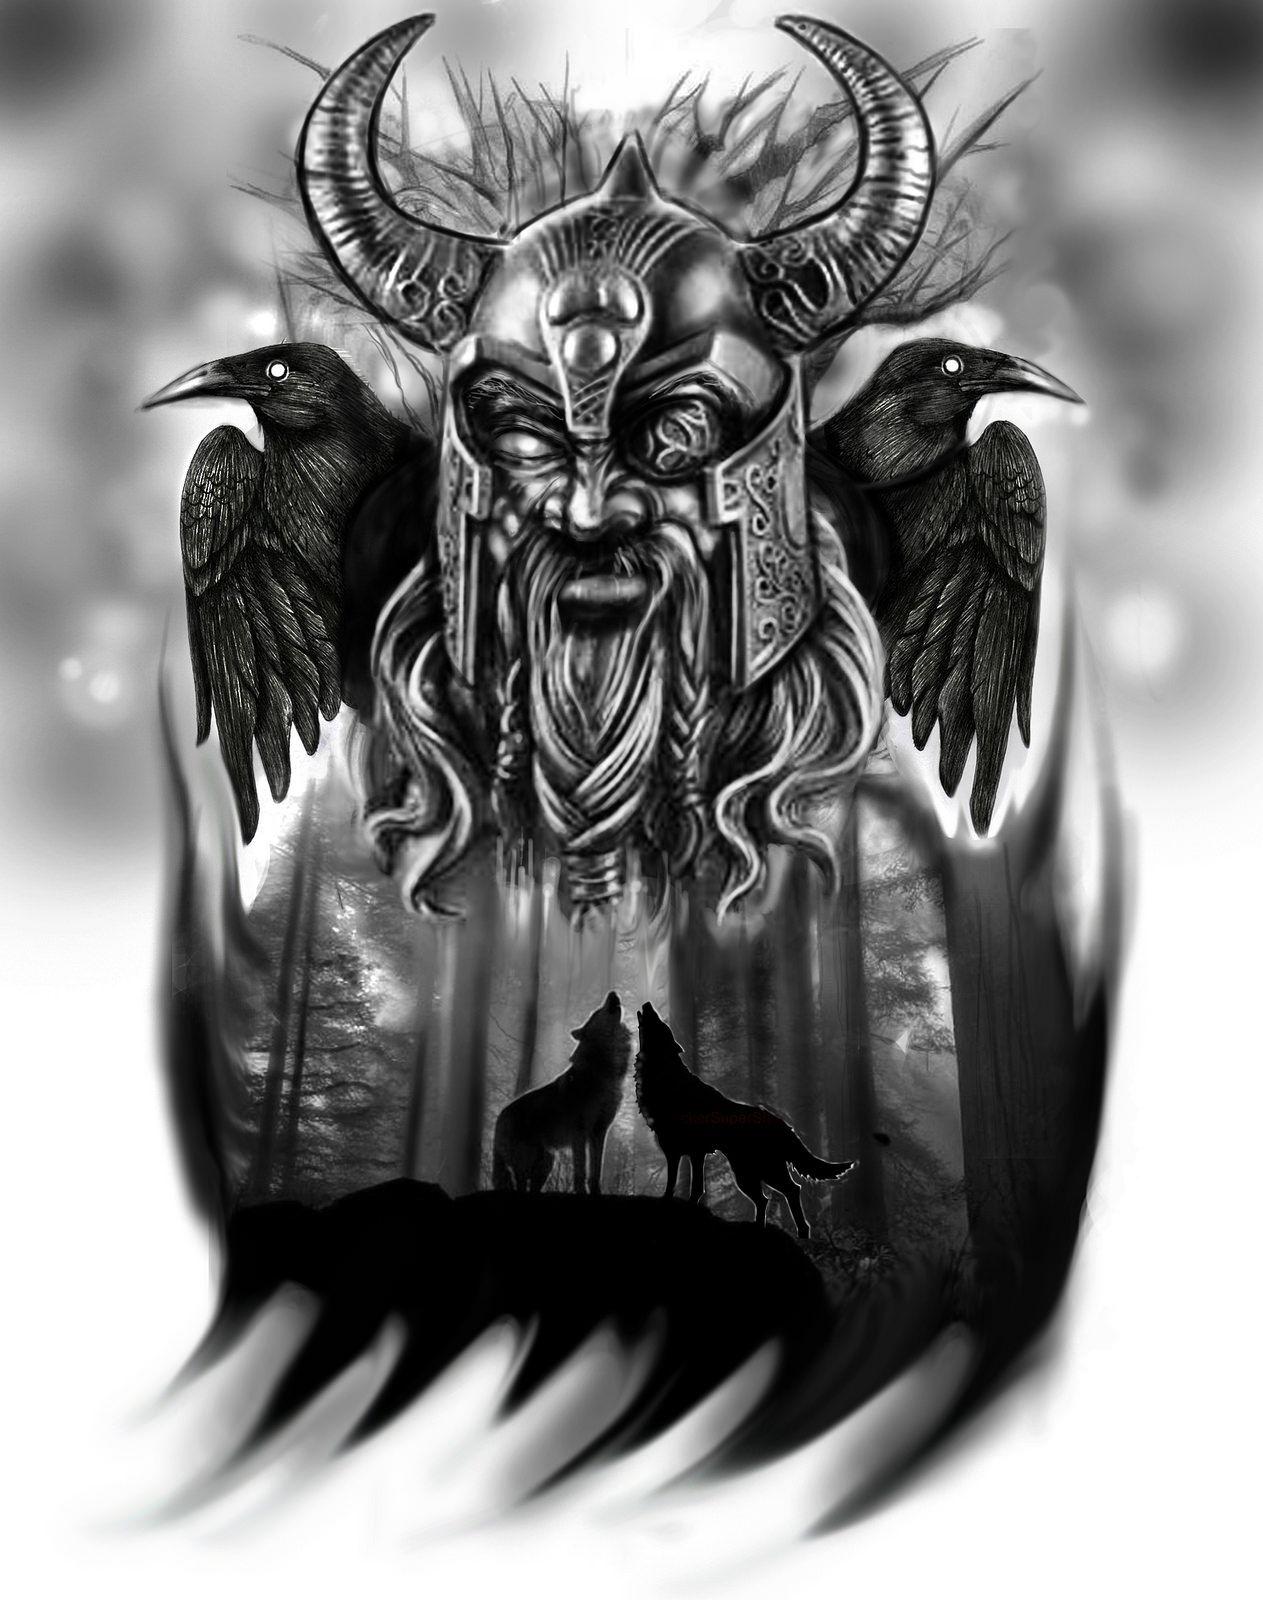 Odin Tattoo Idea татуировки эскизы викинг татуировки идеи для